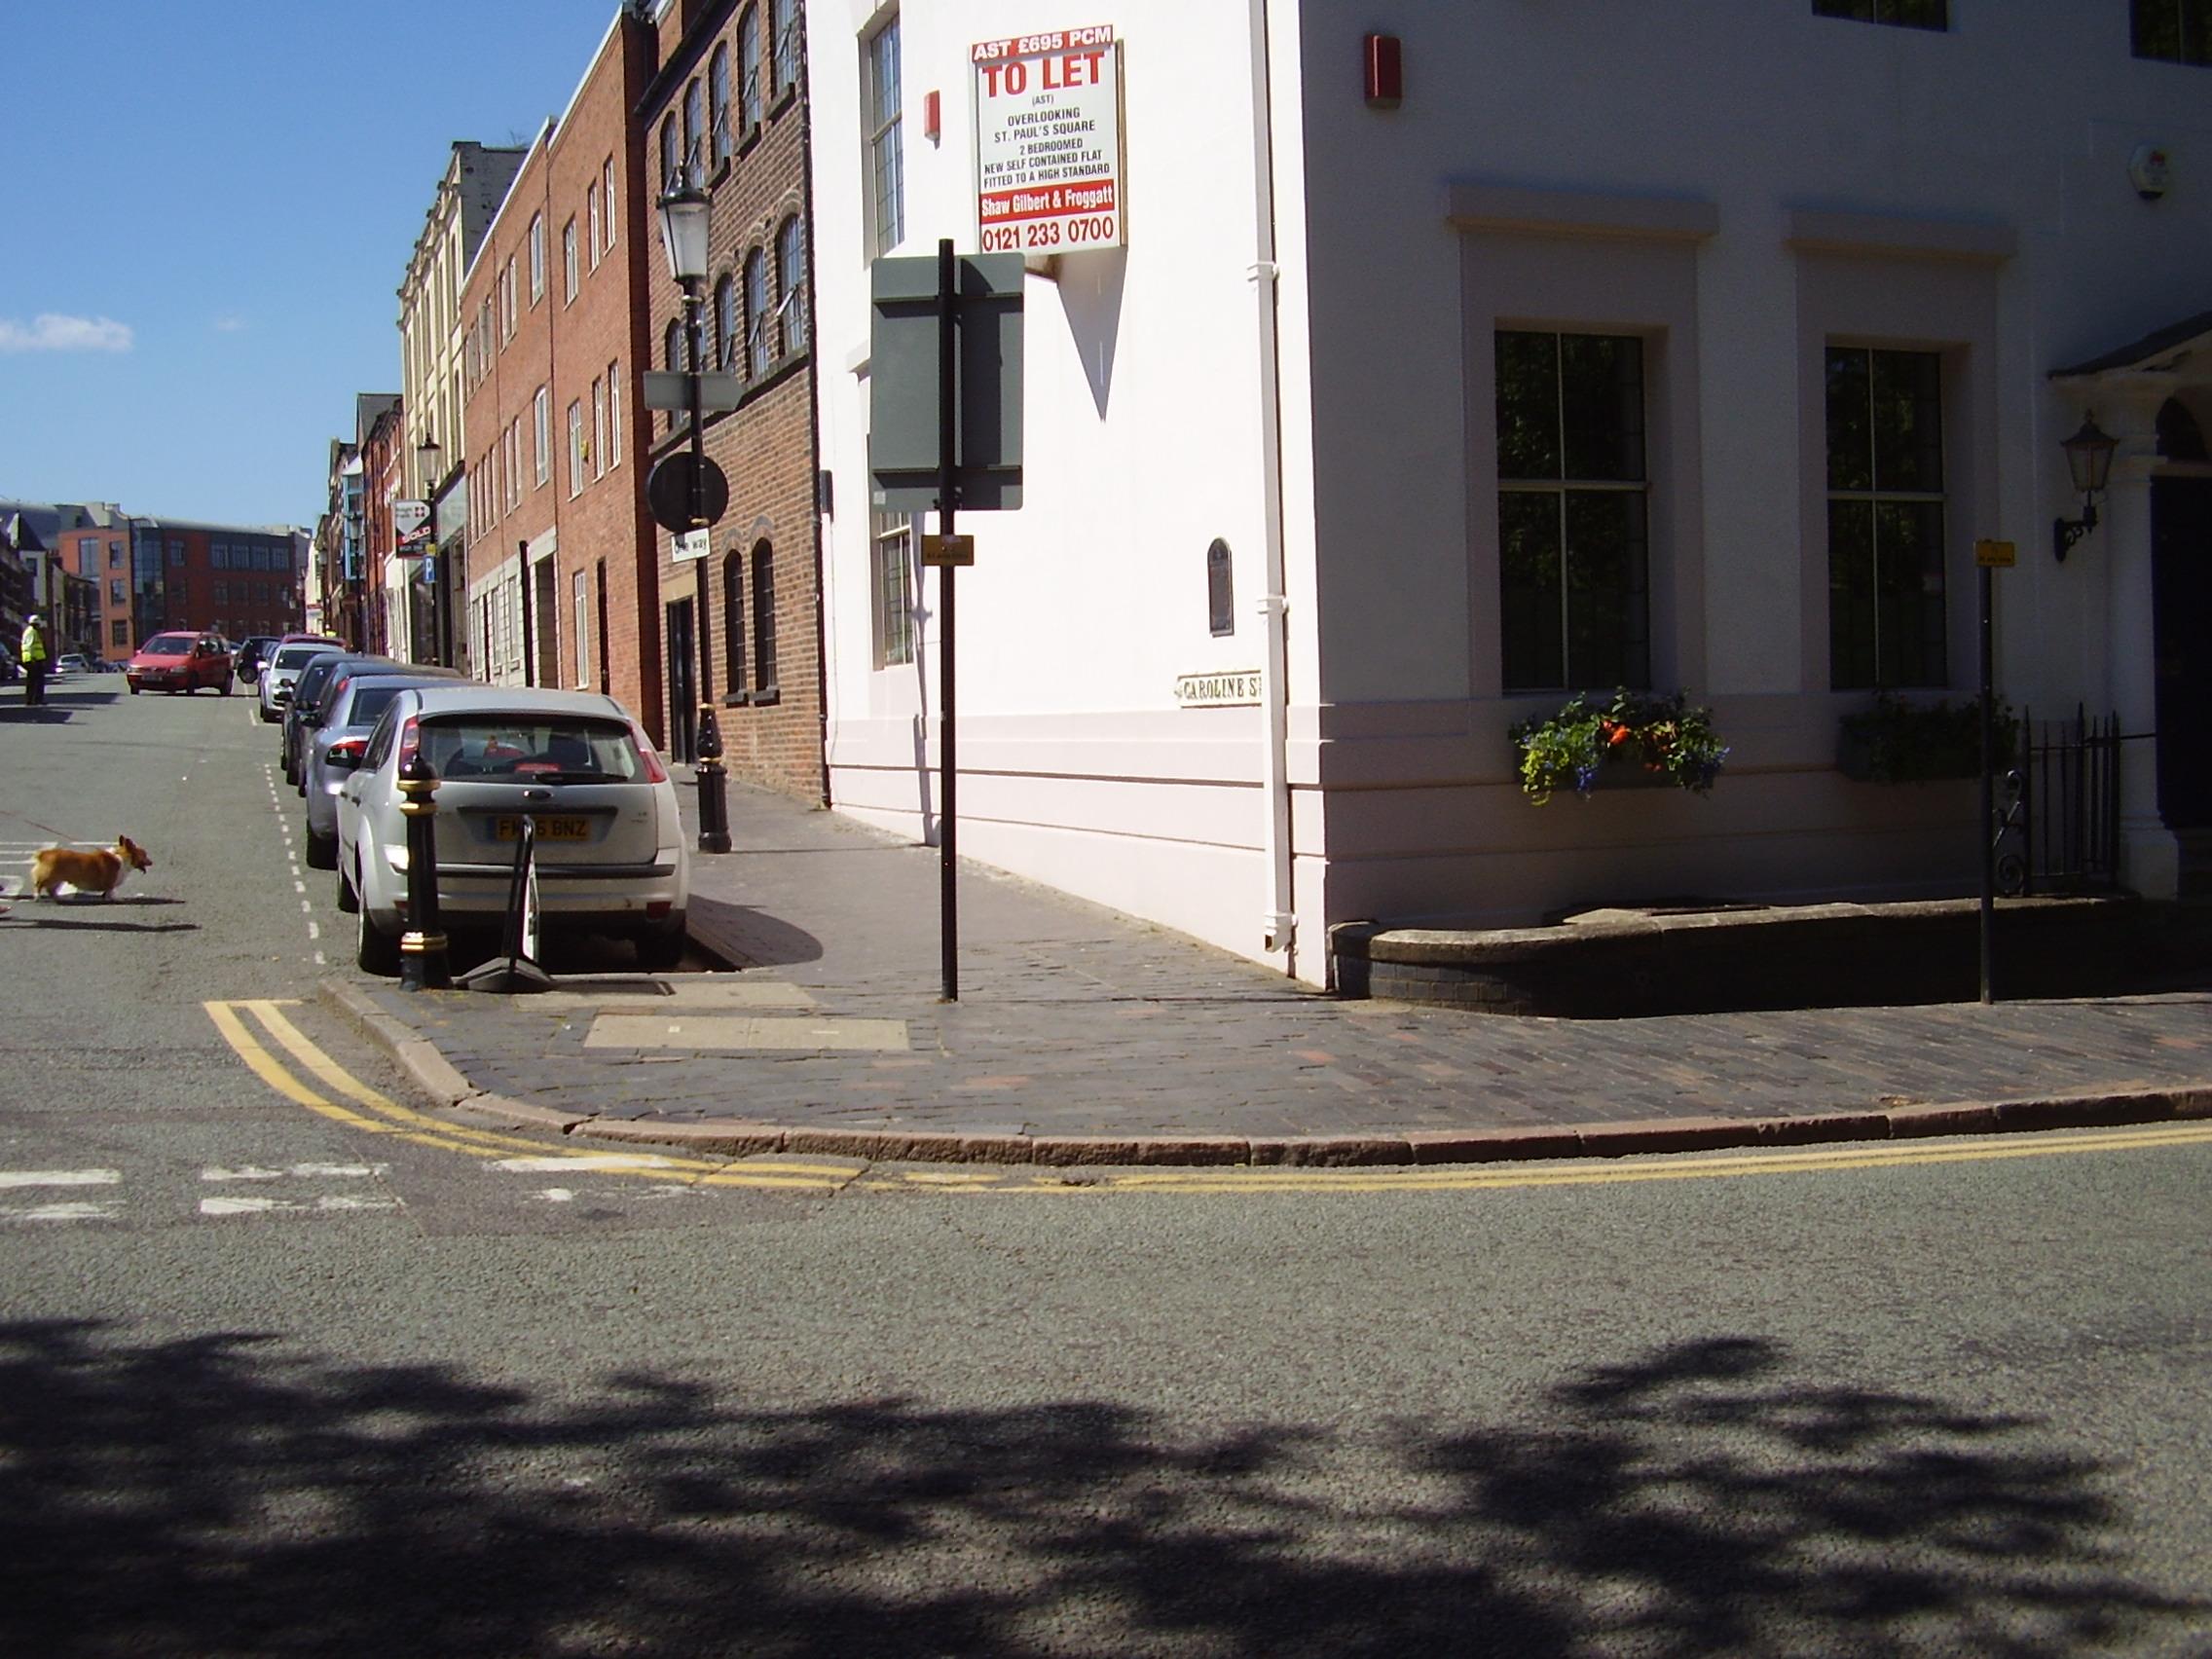 2008 Street view photo 9 of the Jewellery Quarter Birmingham